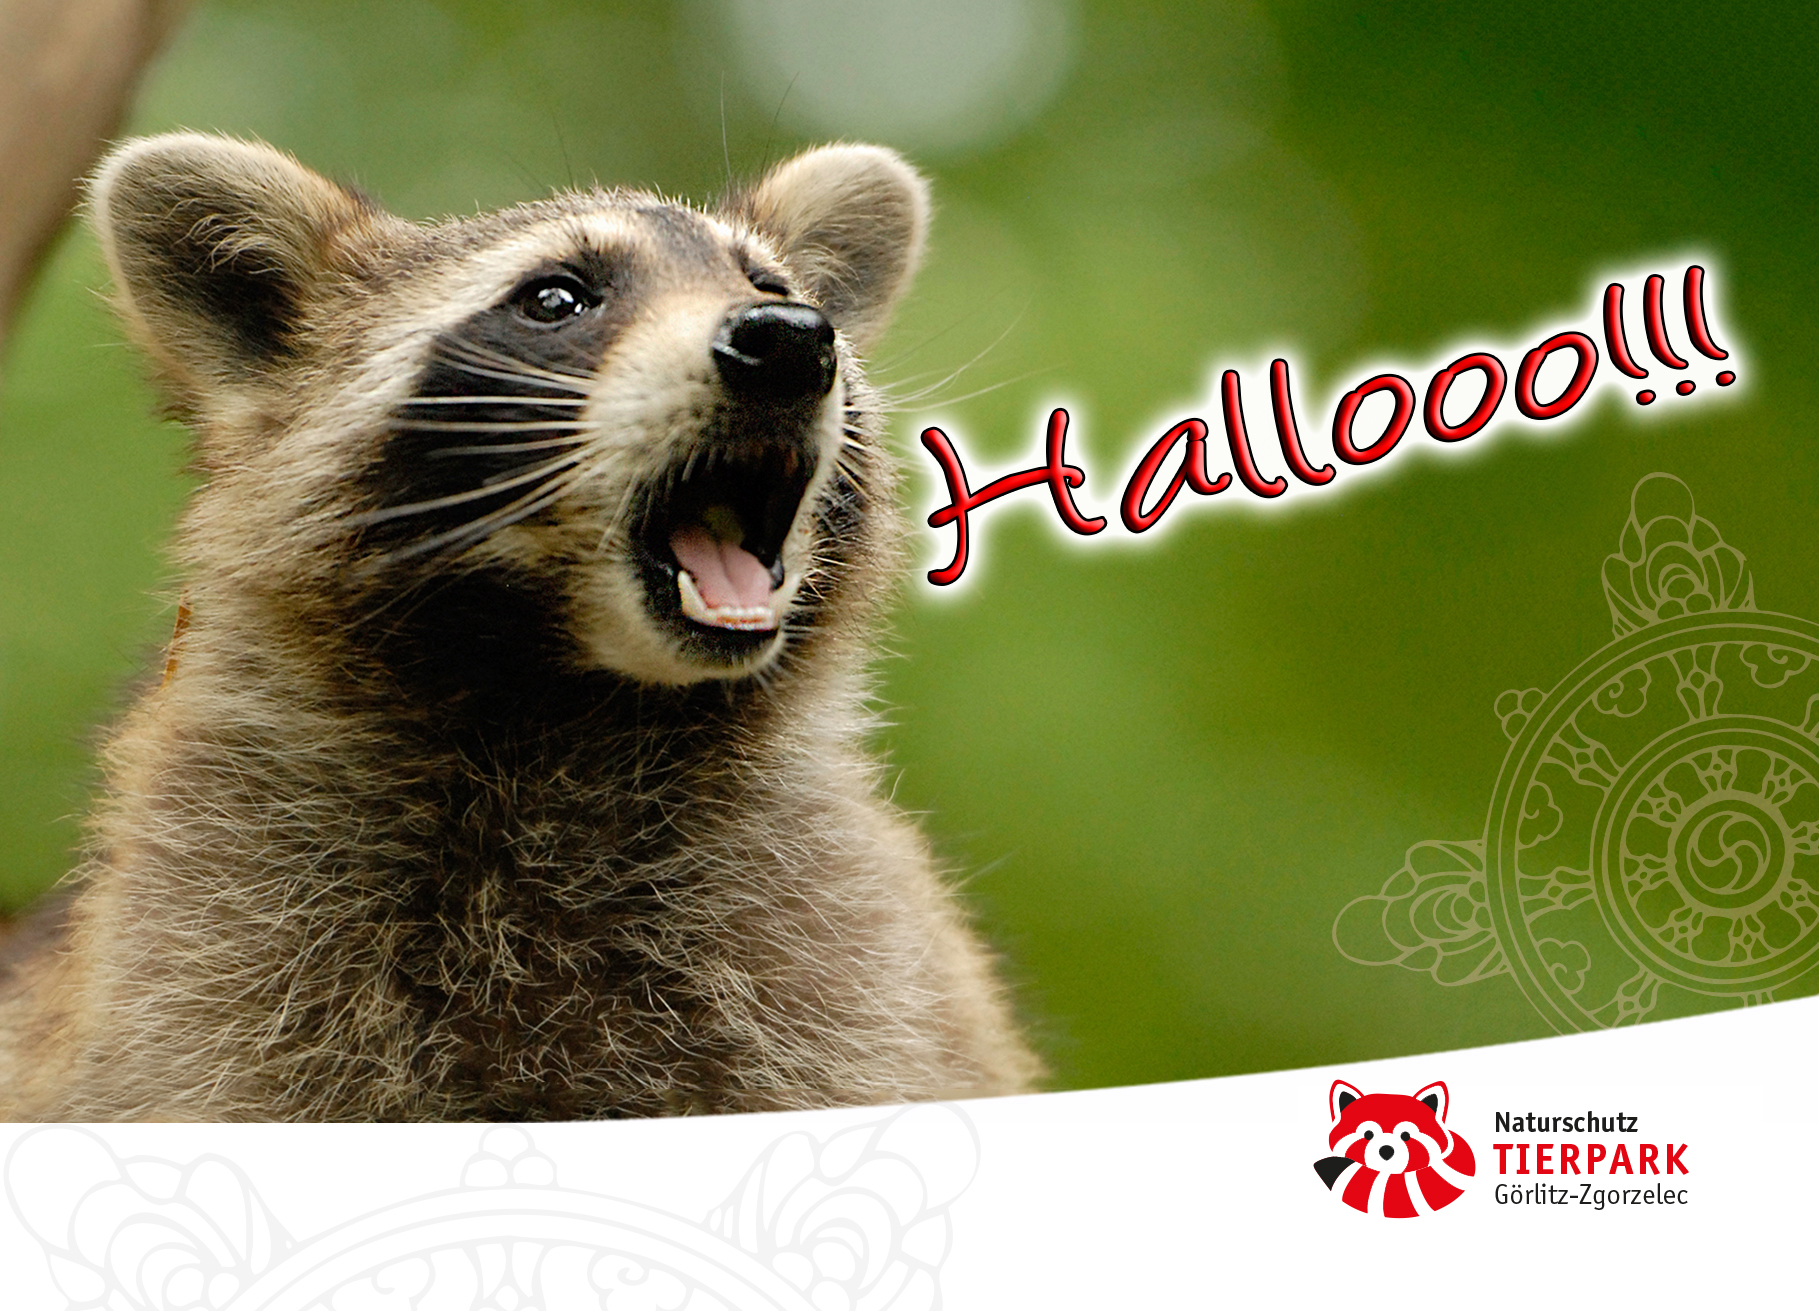 Postkarte Waschbär: Hallooo!!!